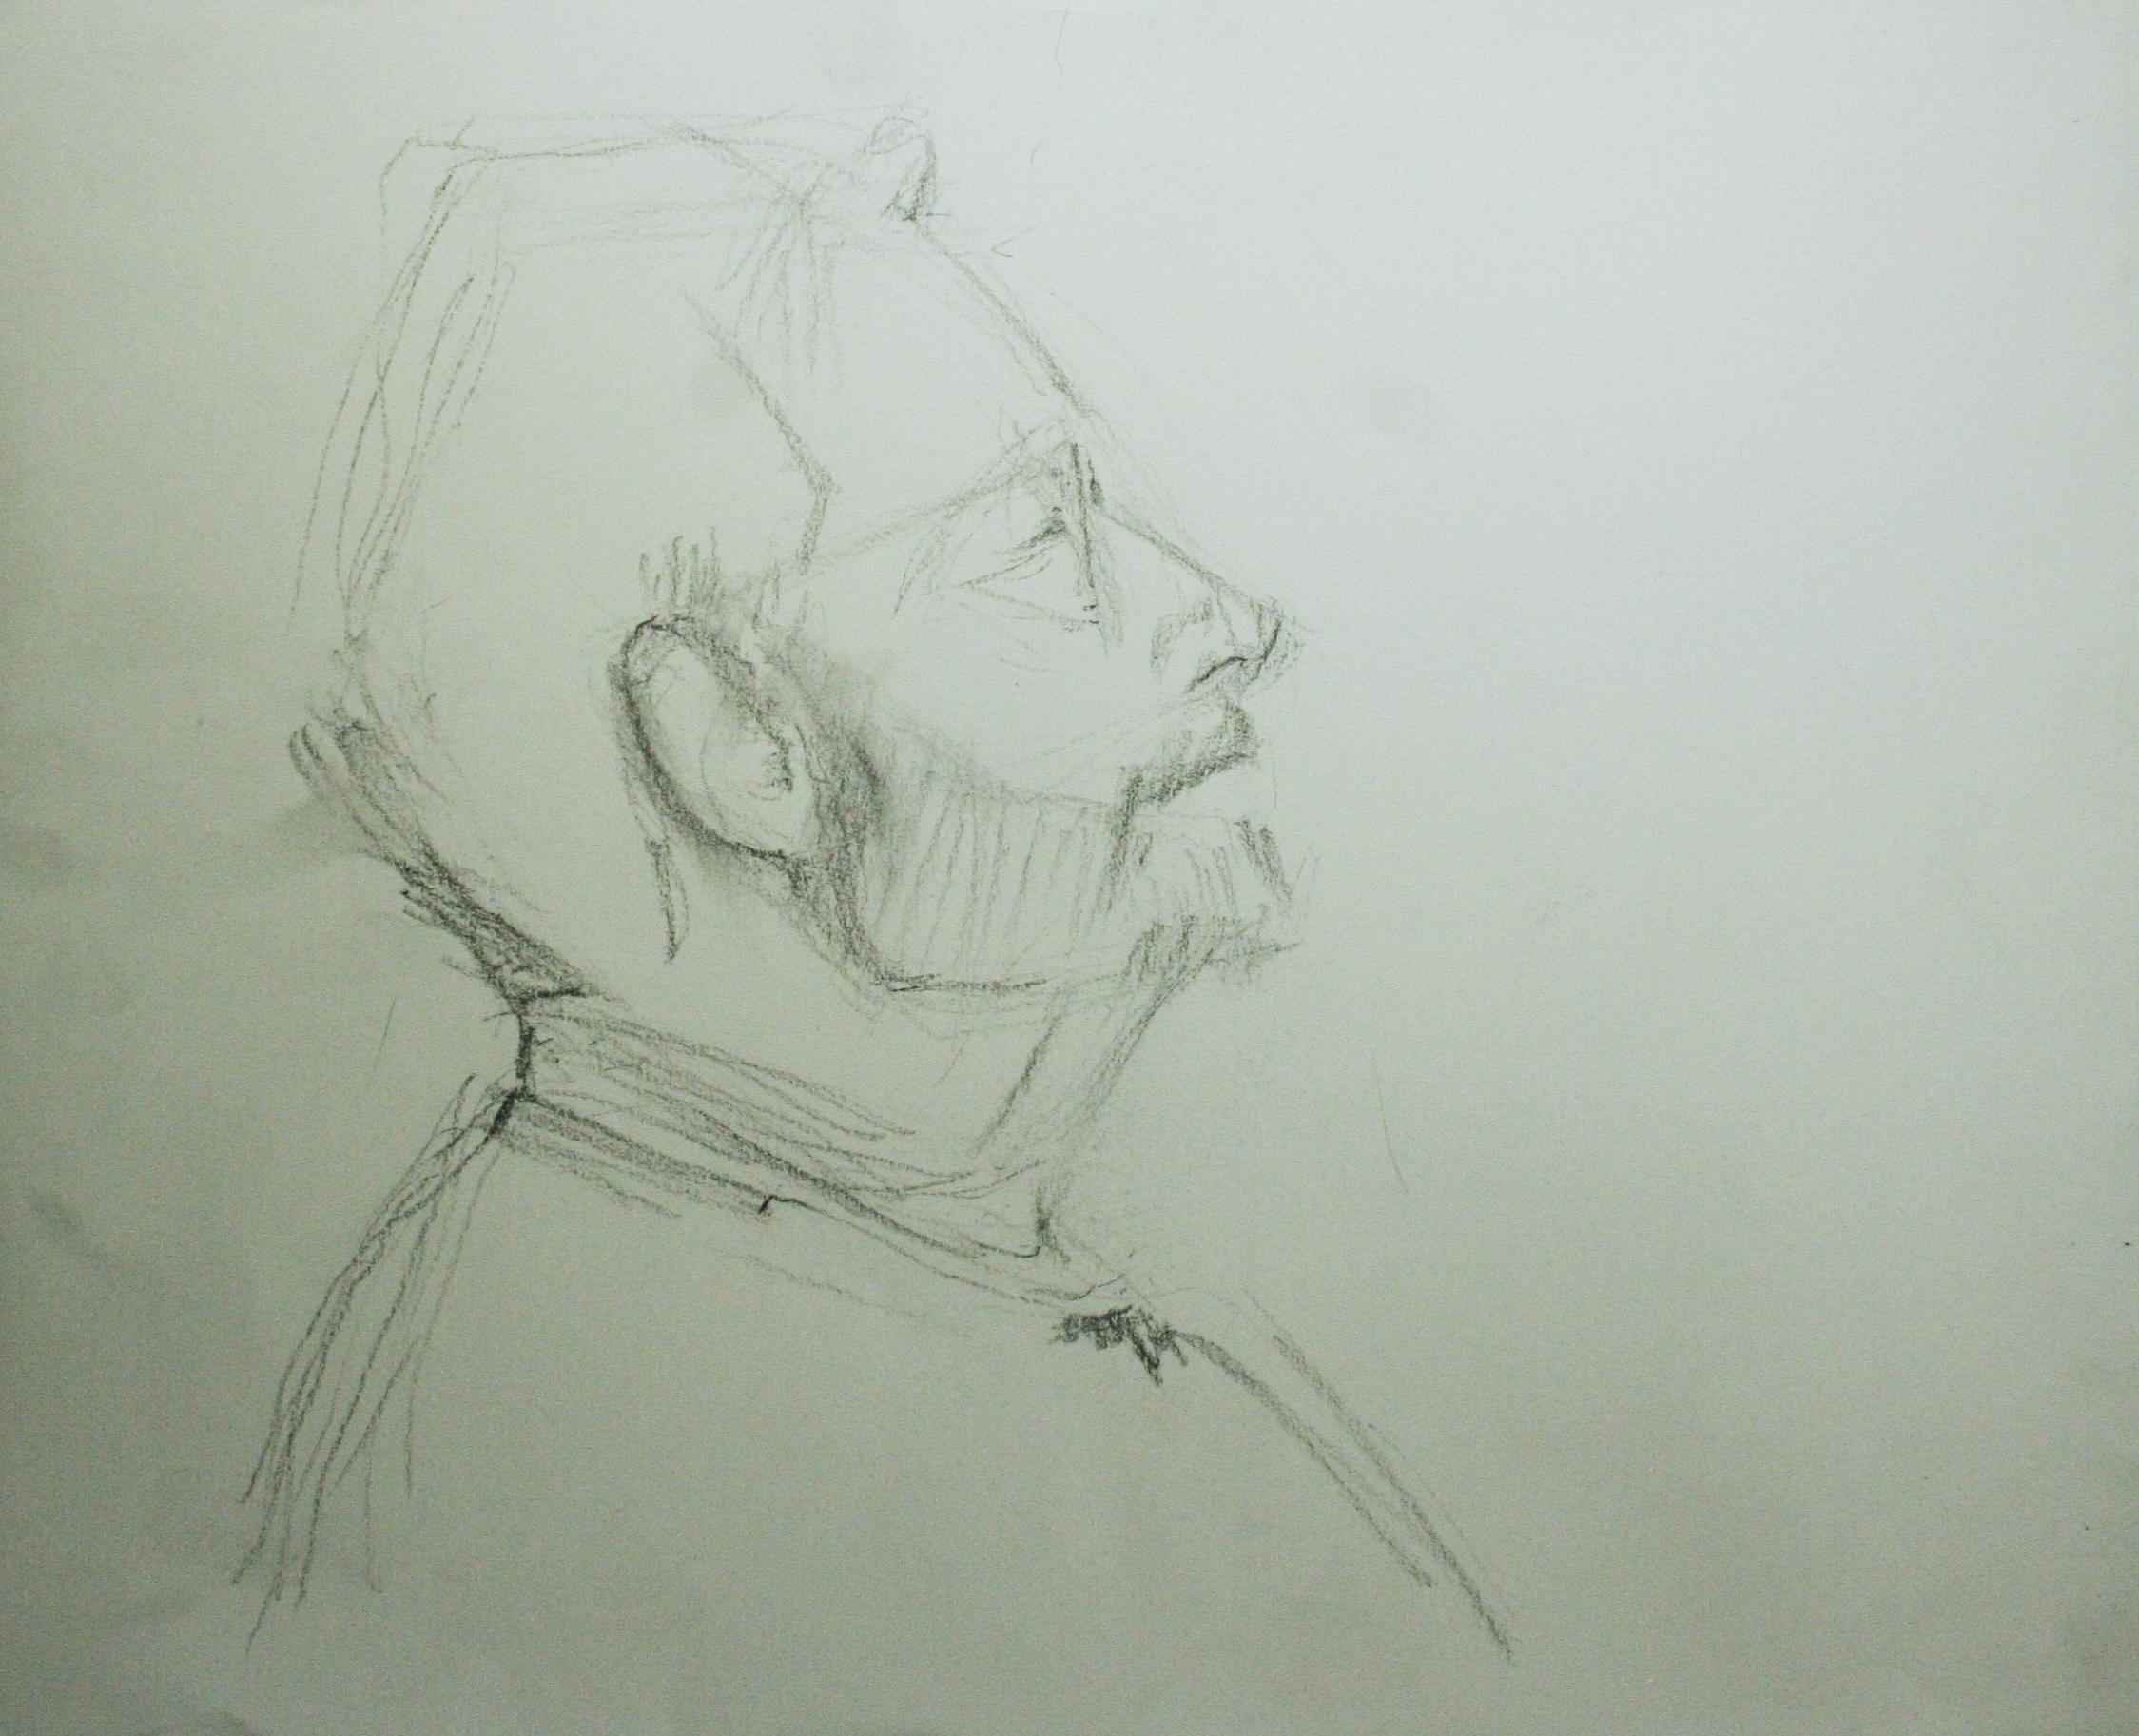 William Leedy did this half hour sketch.